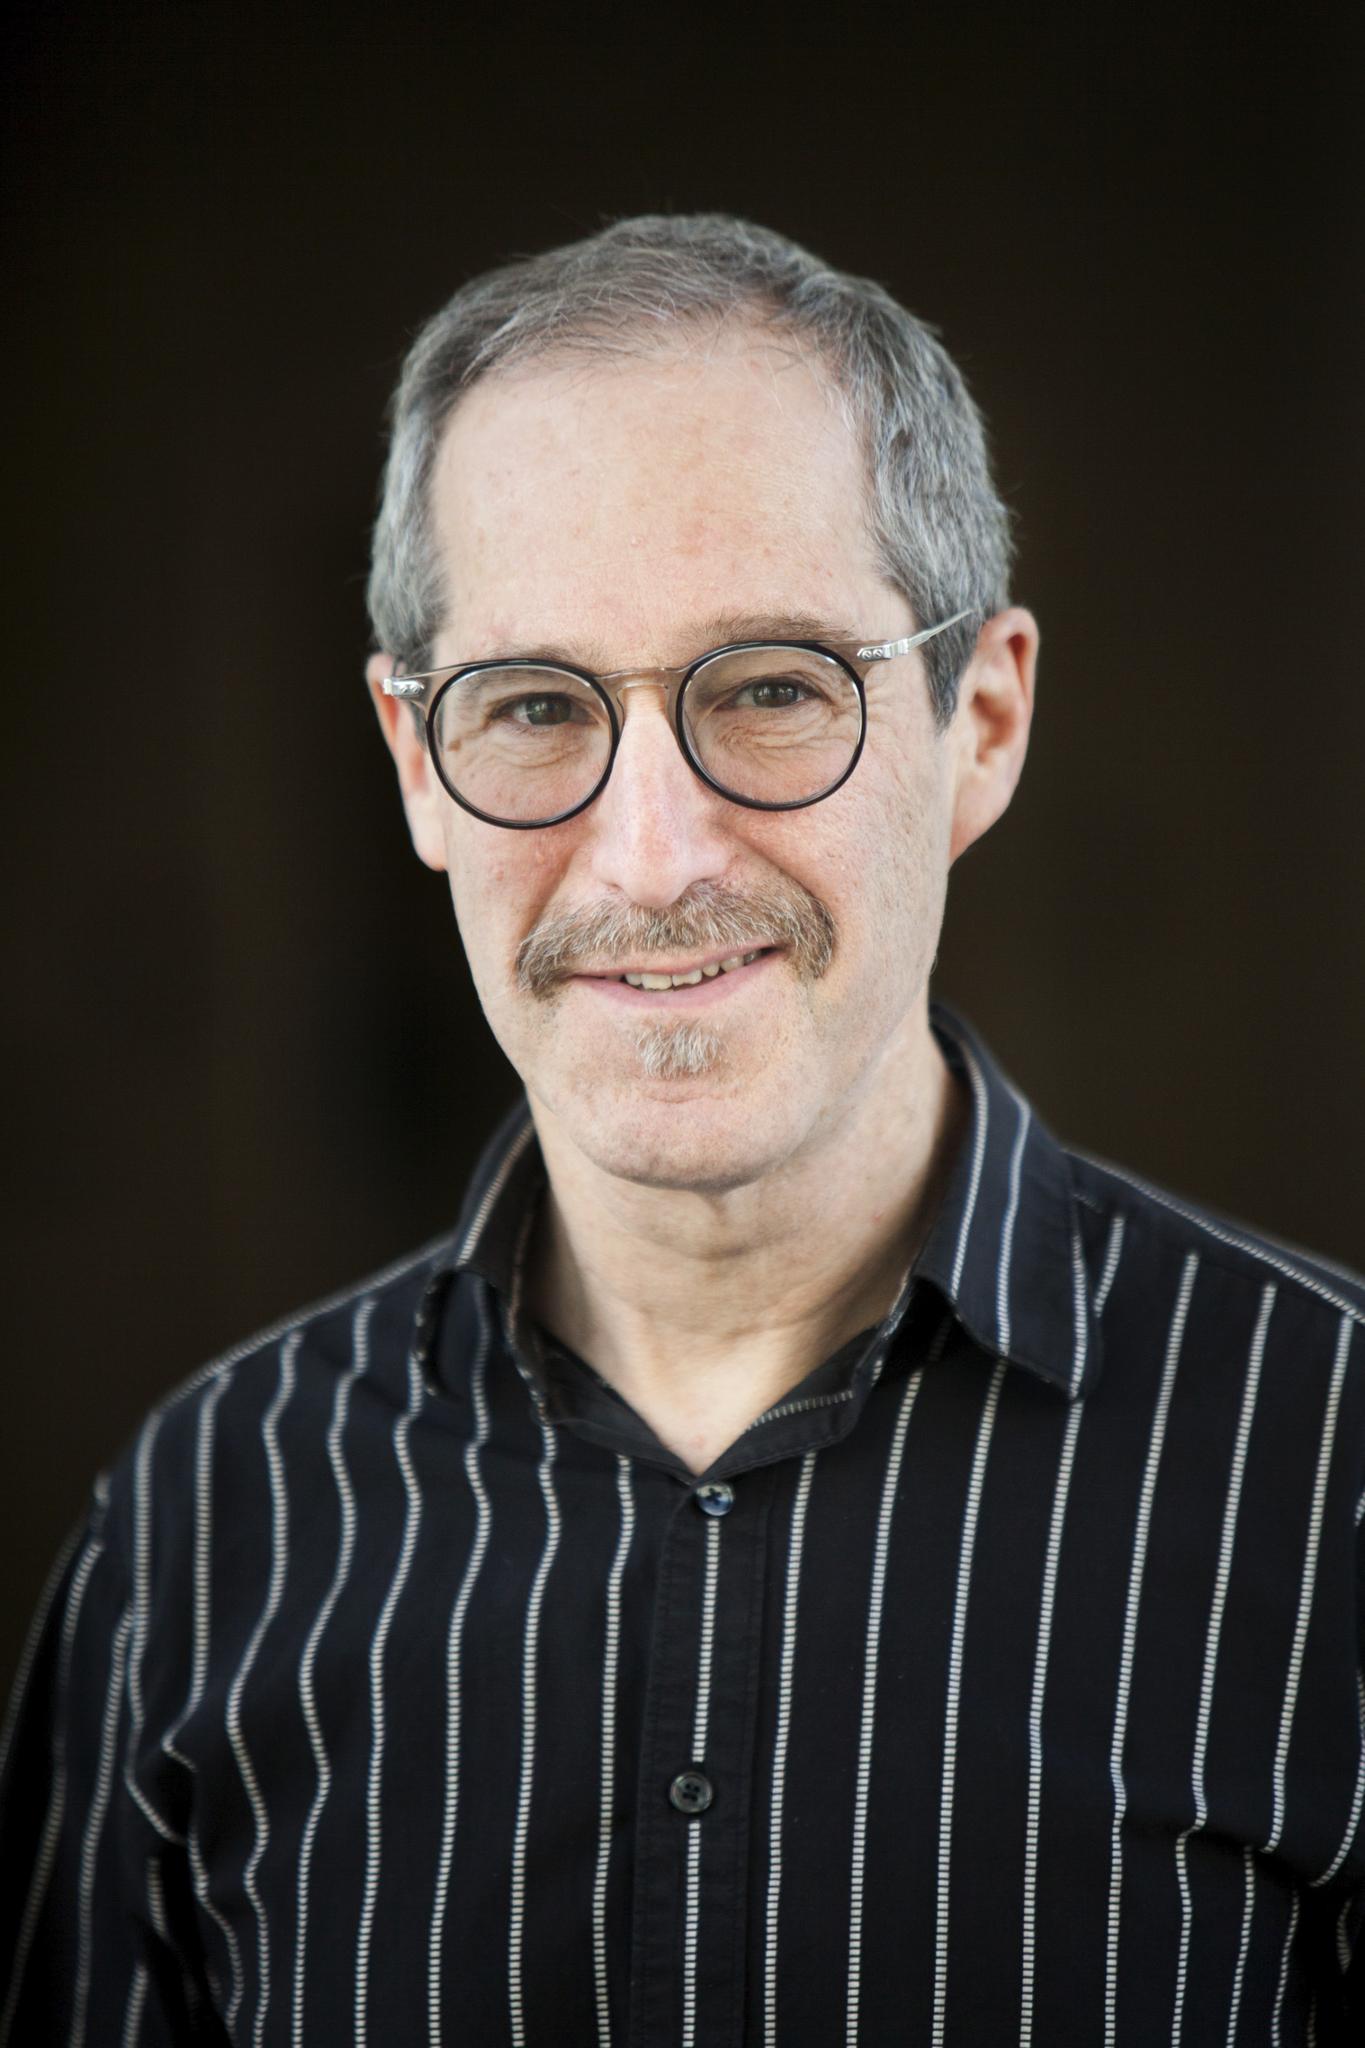 Michael L. Honig